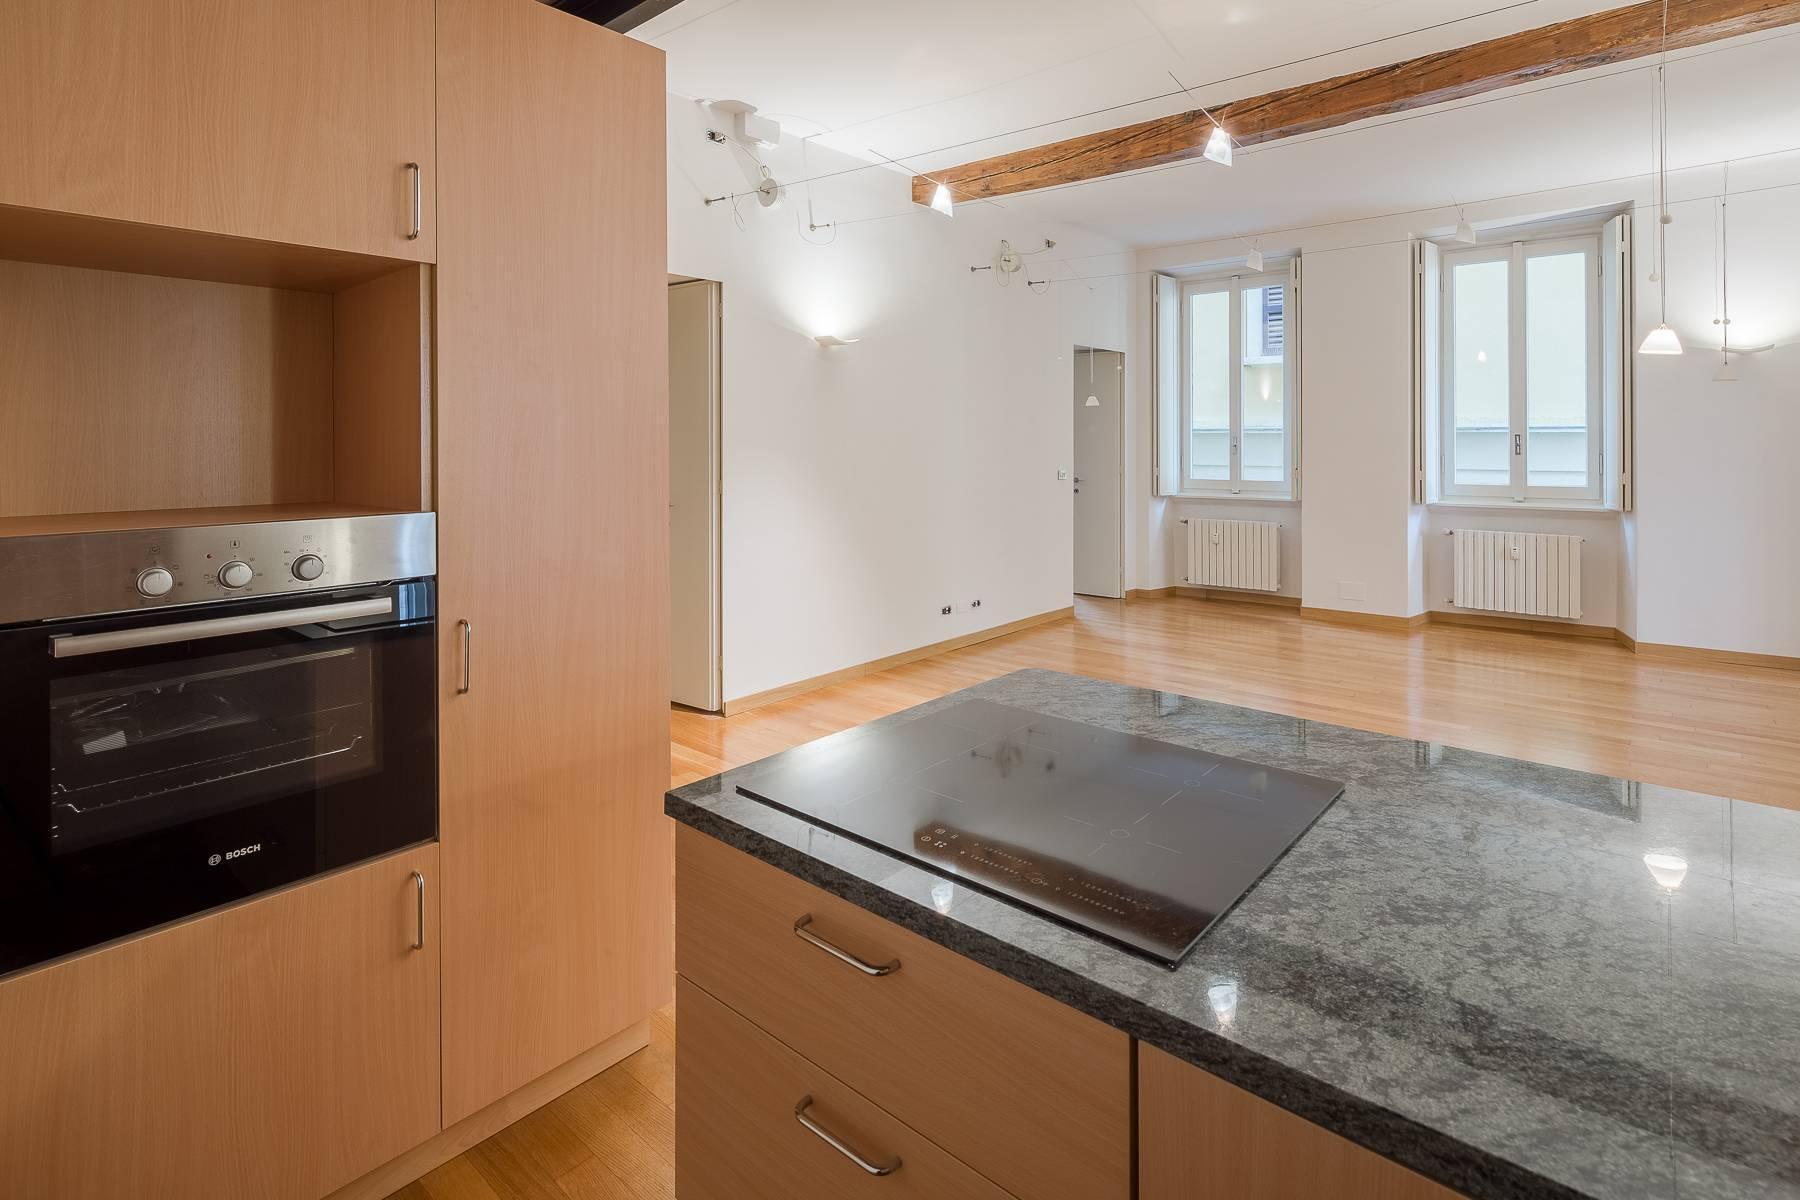 Apartment in an elegant period building located in a prestigious city district - 10